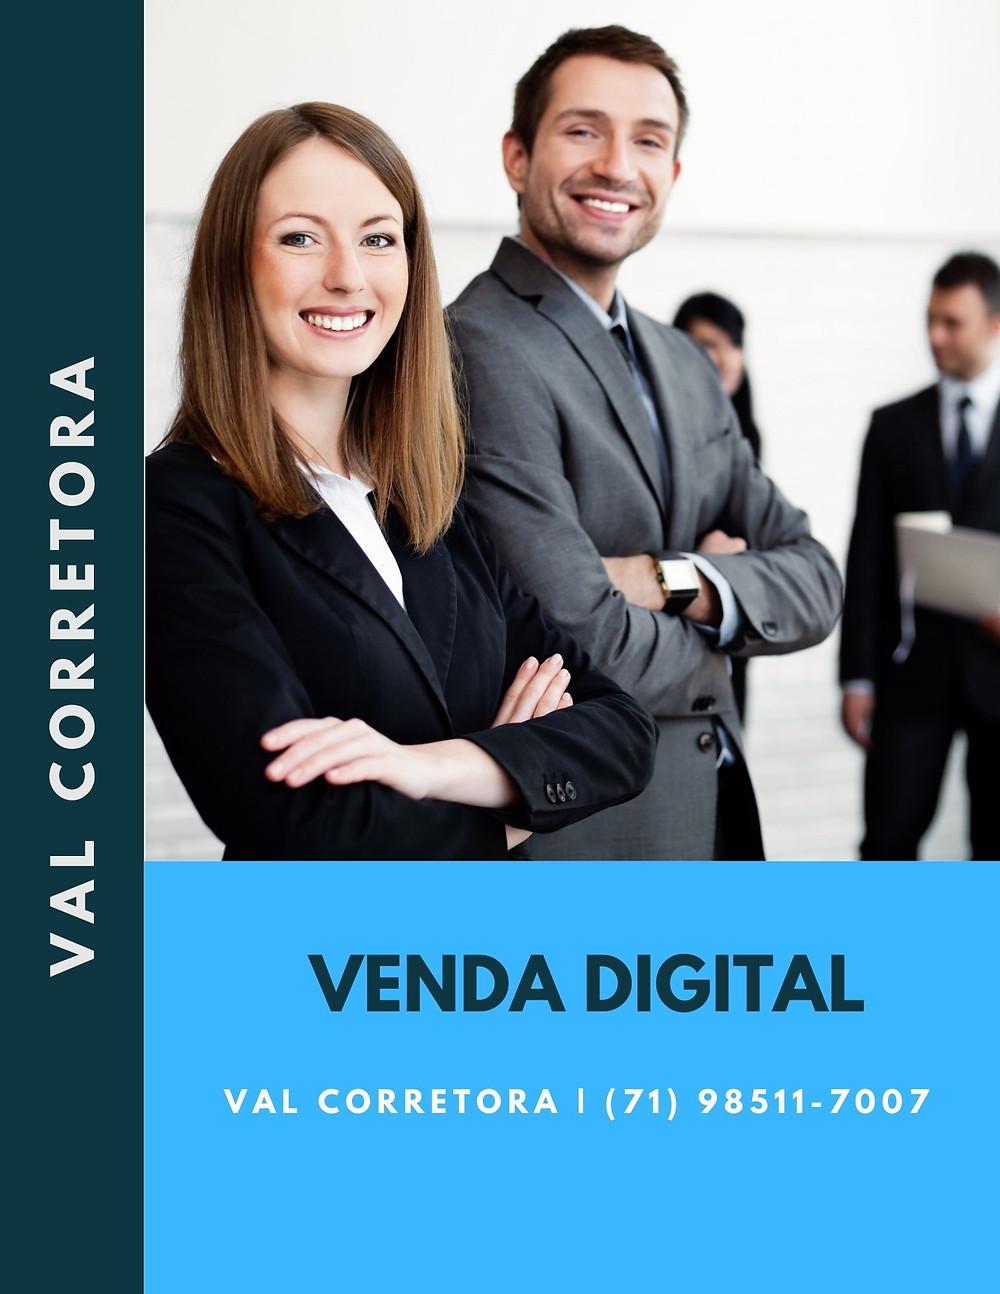 Venda Digital Porto Seguro Odonto Empresarial